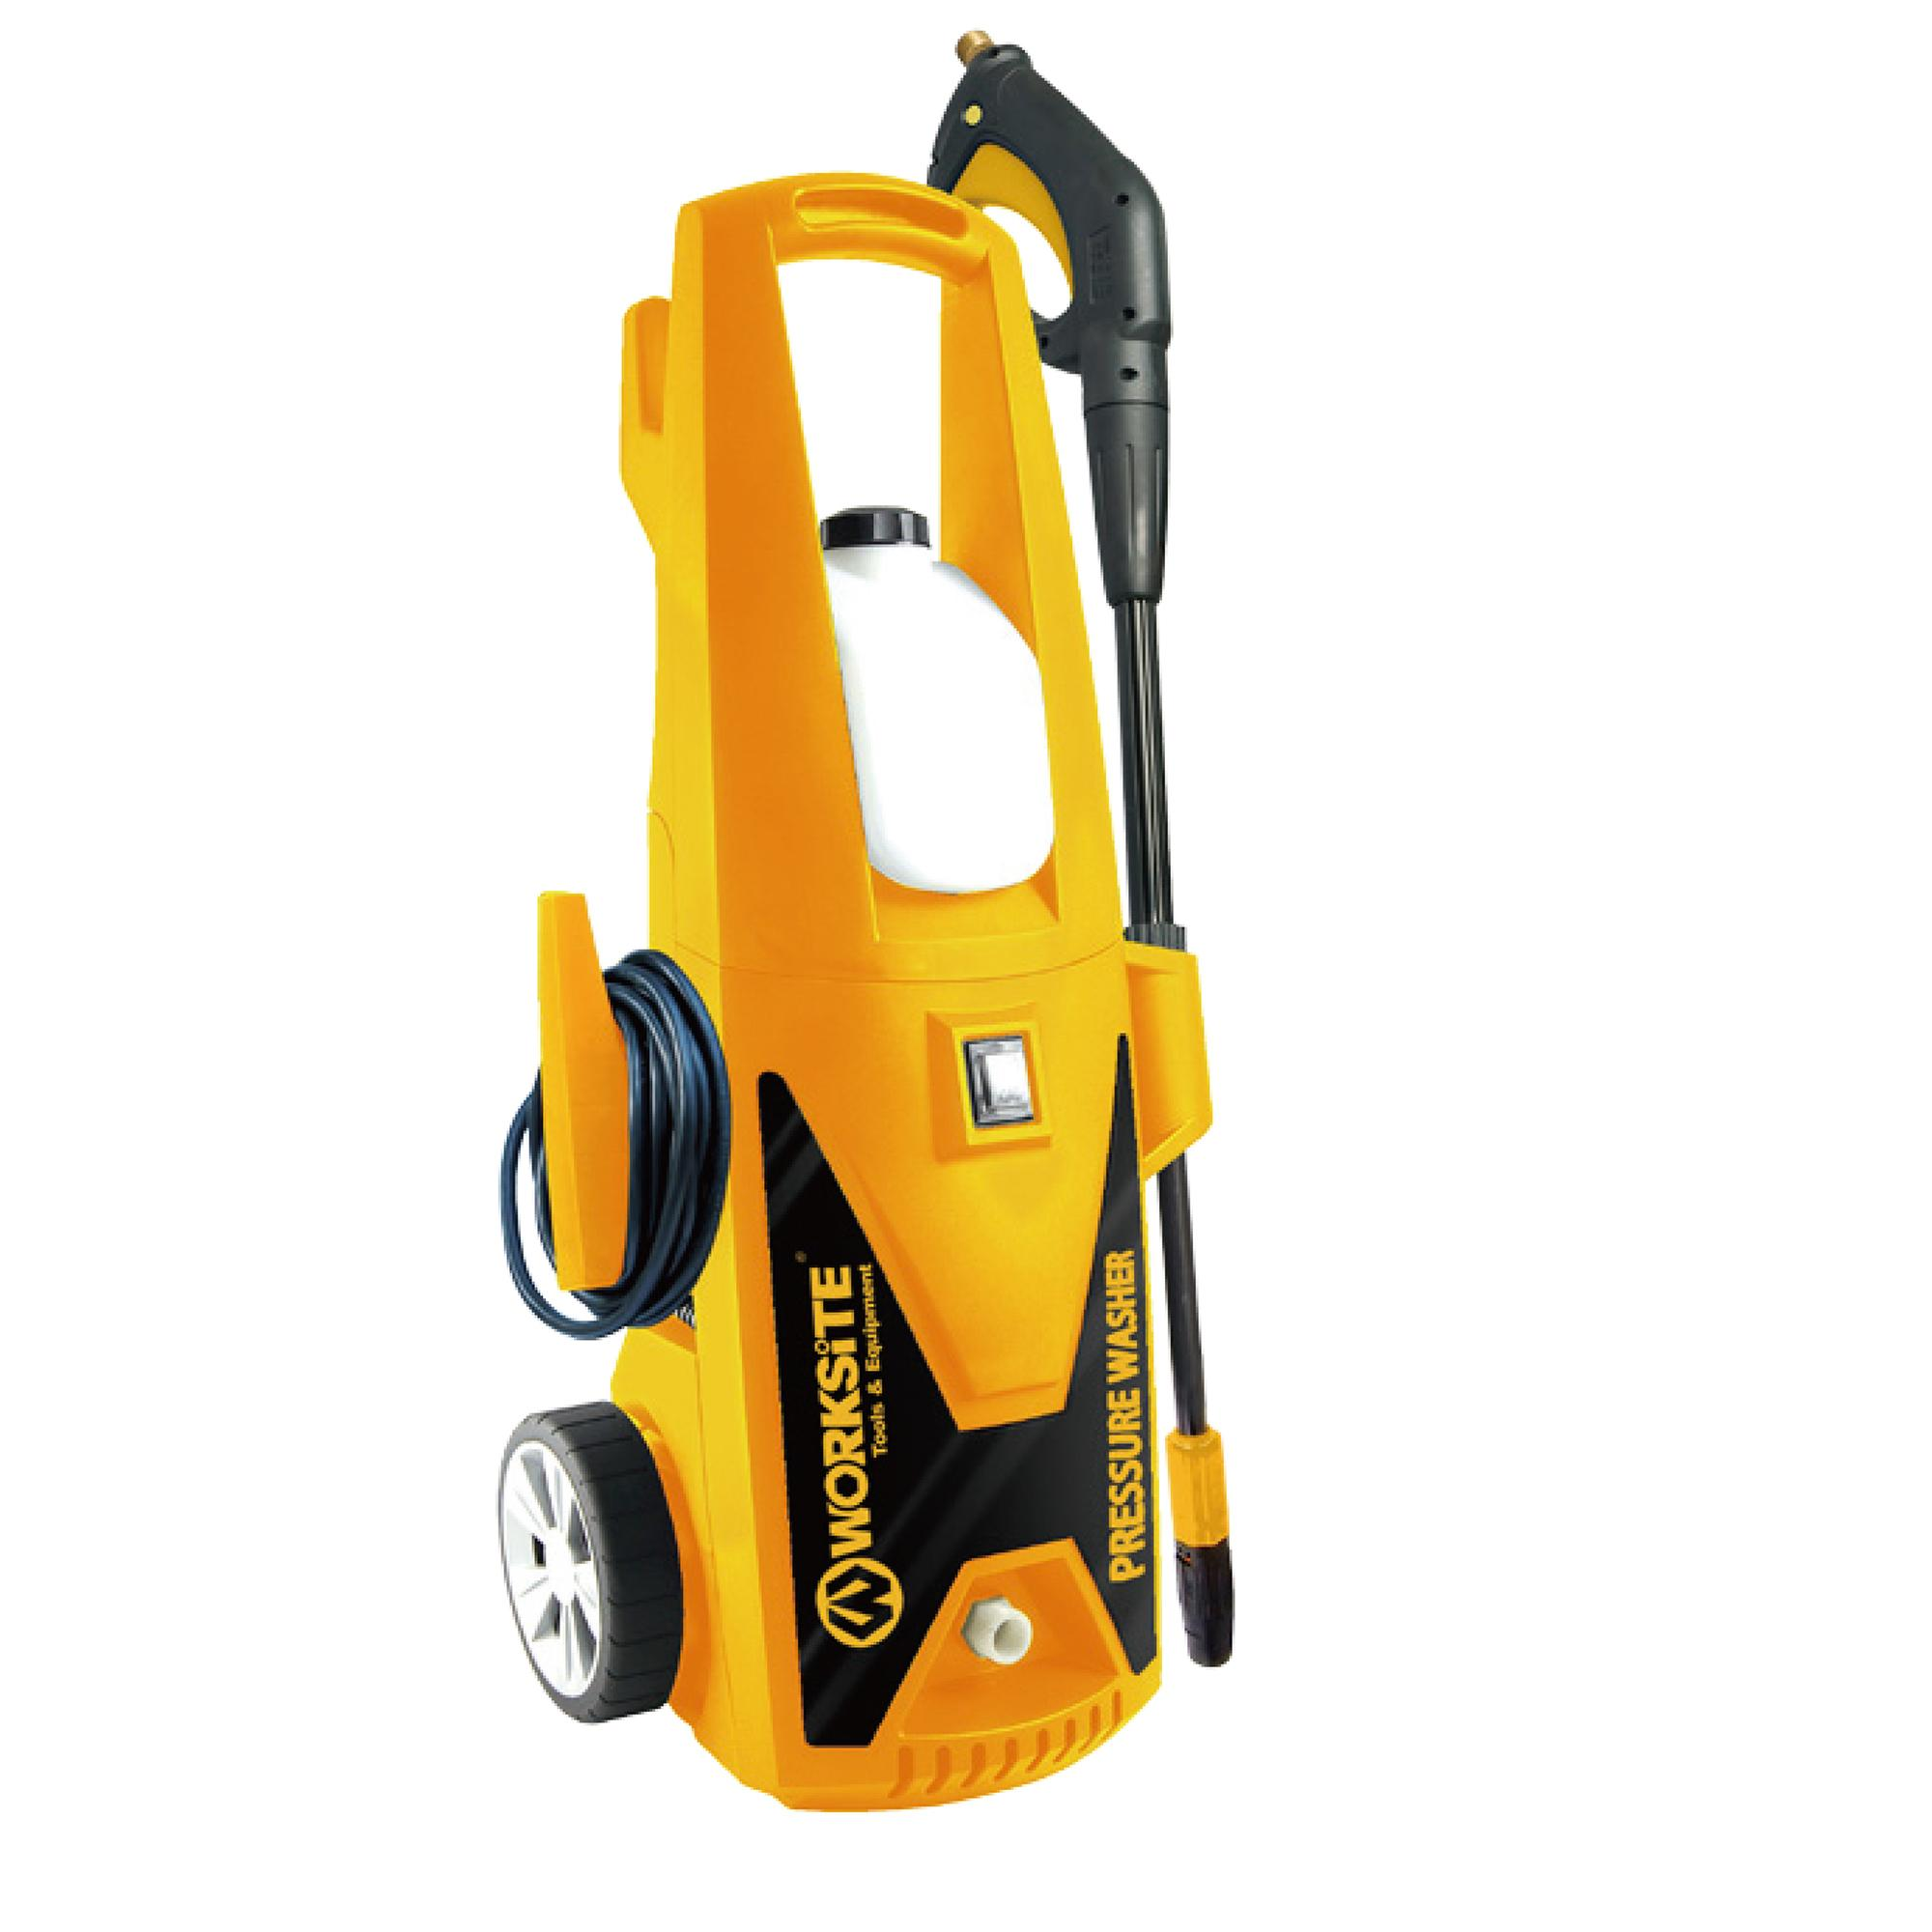 Máy phun rửa áp lực Worksite HPW163 1850W